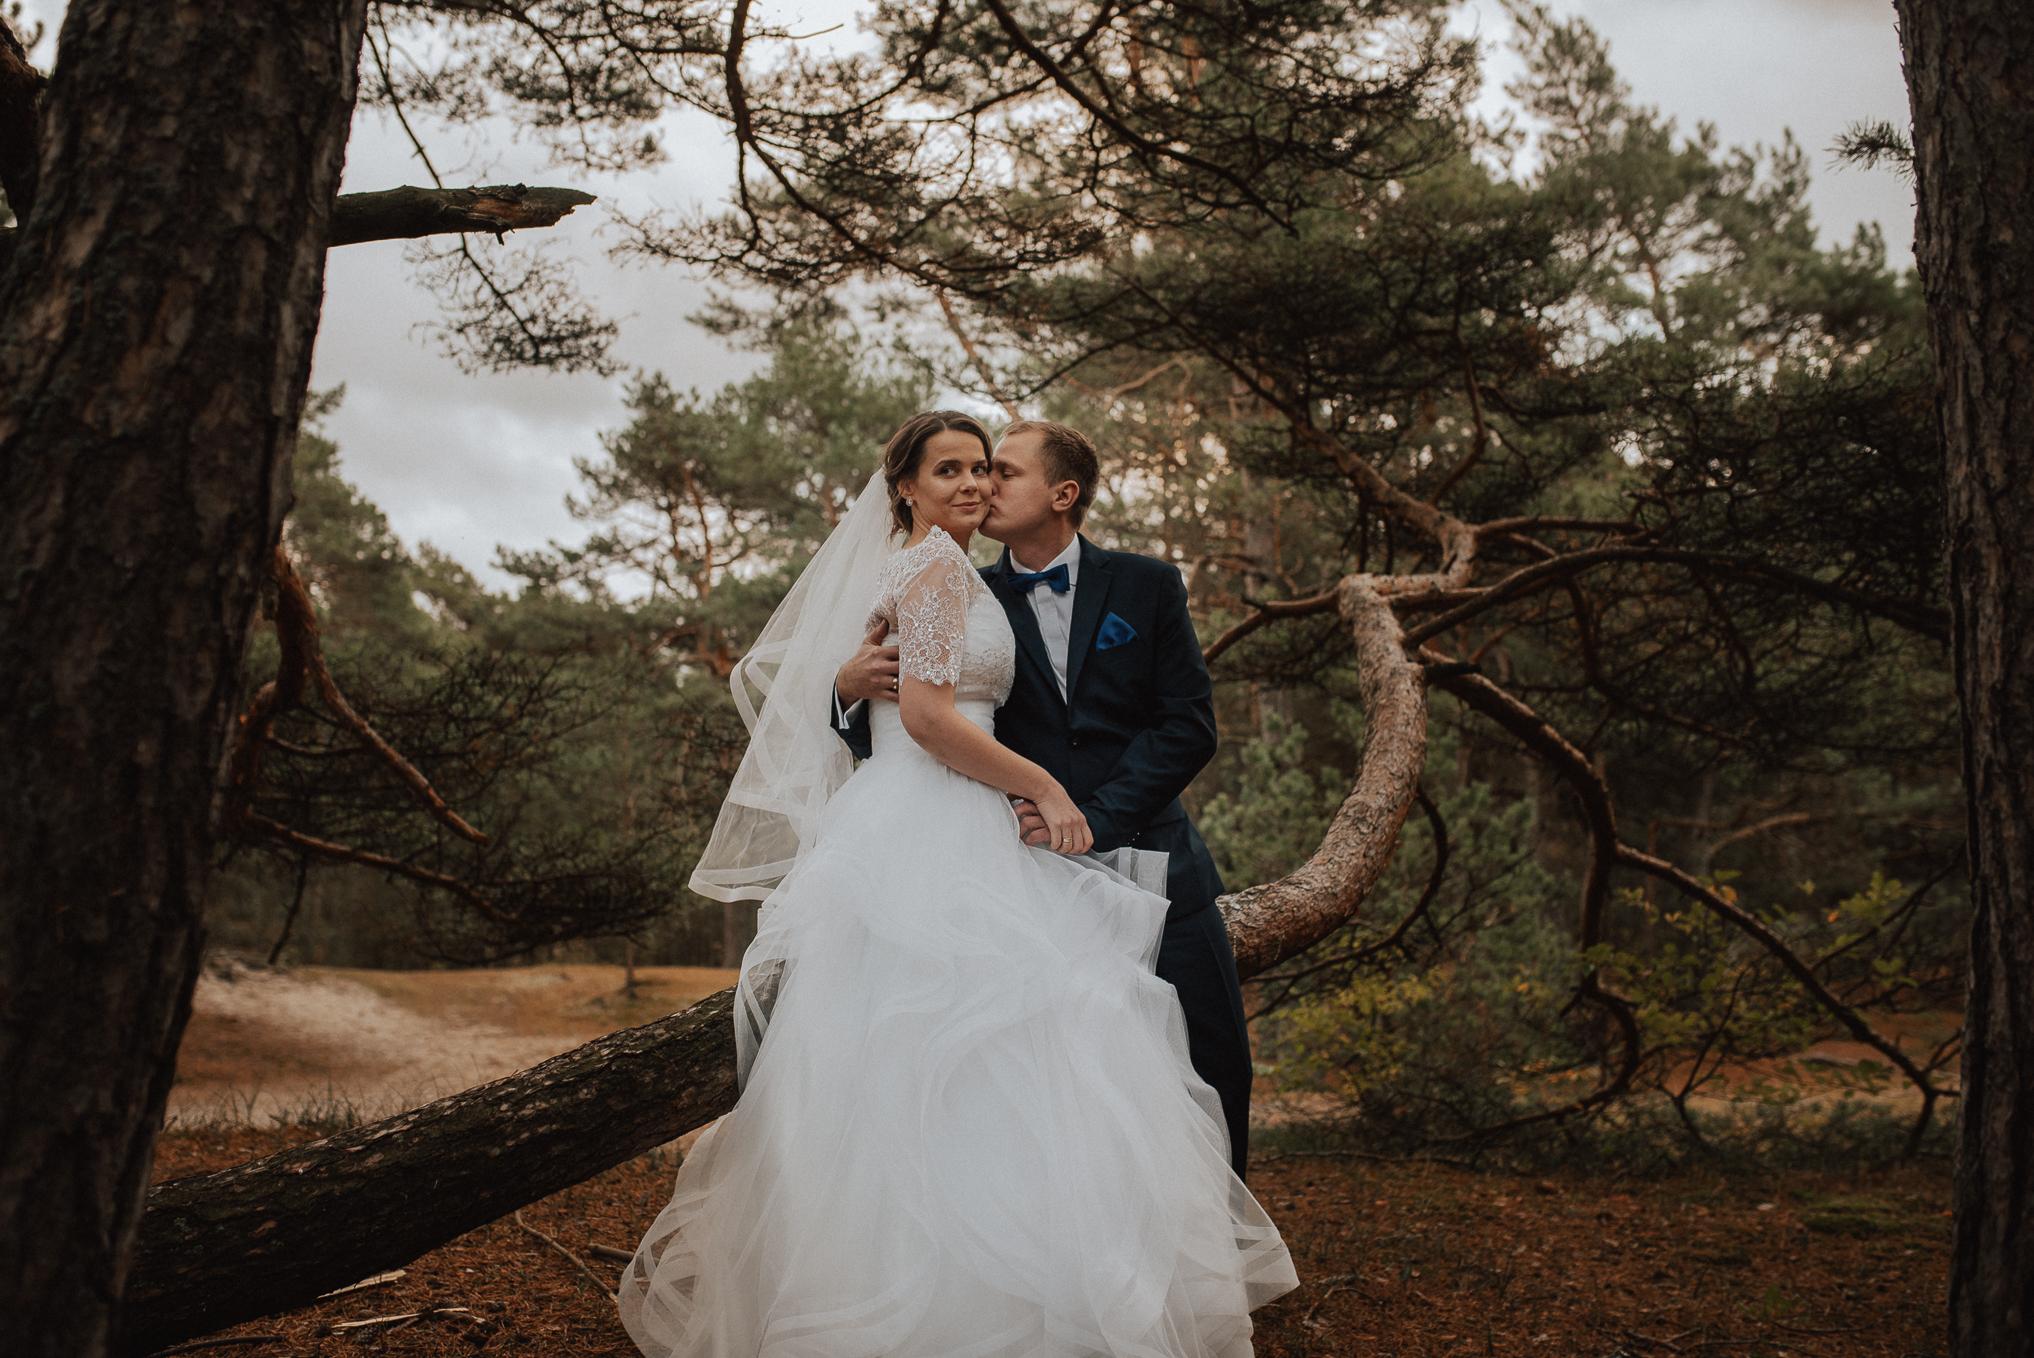 Leśna sesja ślubna 6